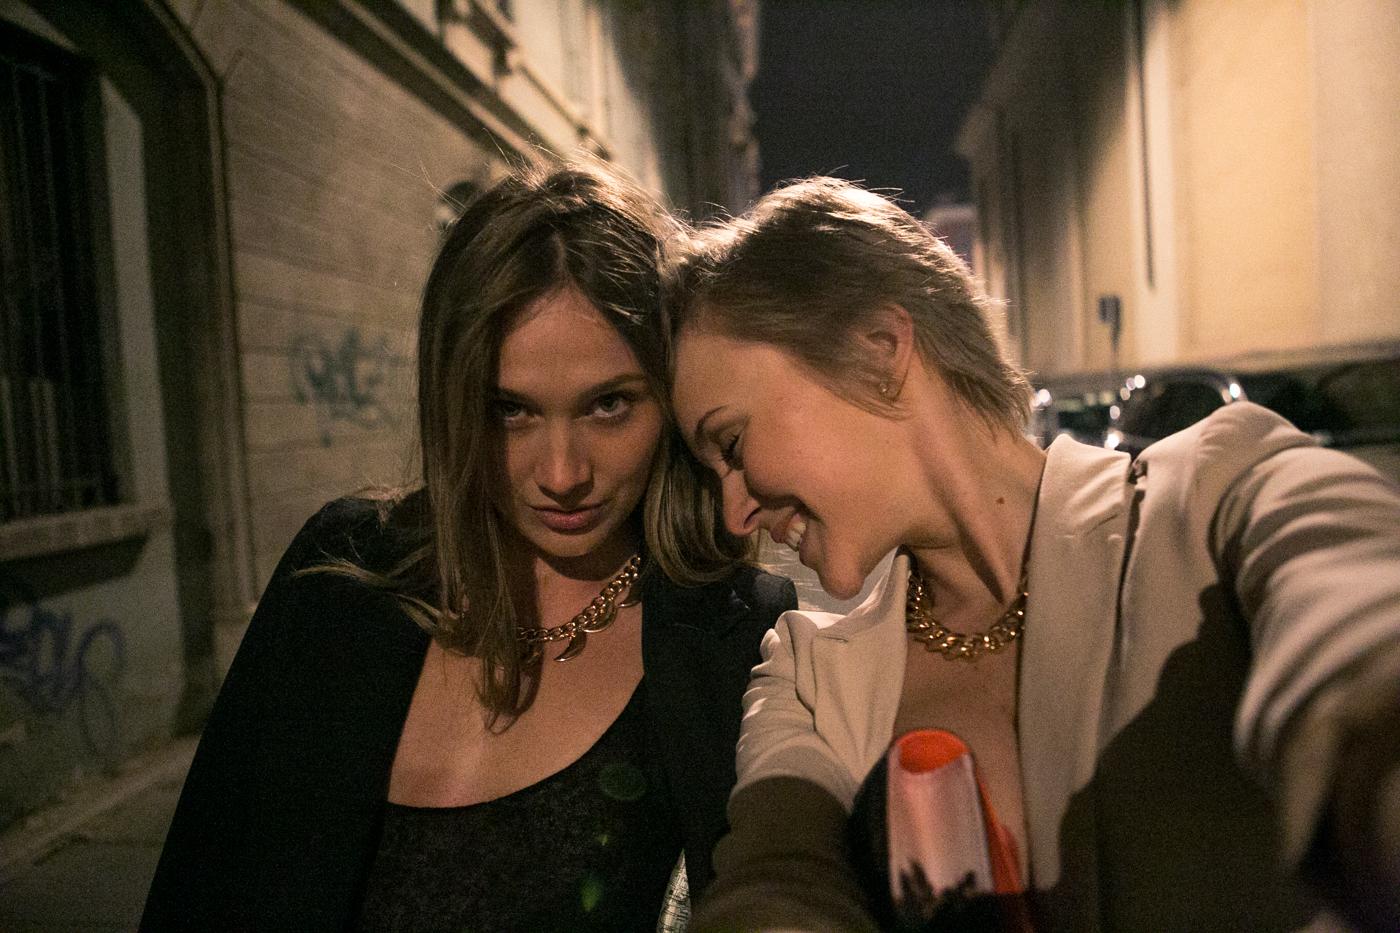 thecablook darya kamalova fashion blog street style asos pants hm top coral beige jacket zara heels brescia at night franco bar piazza duomo-35